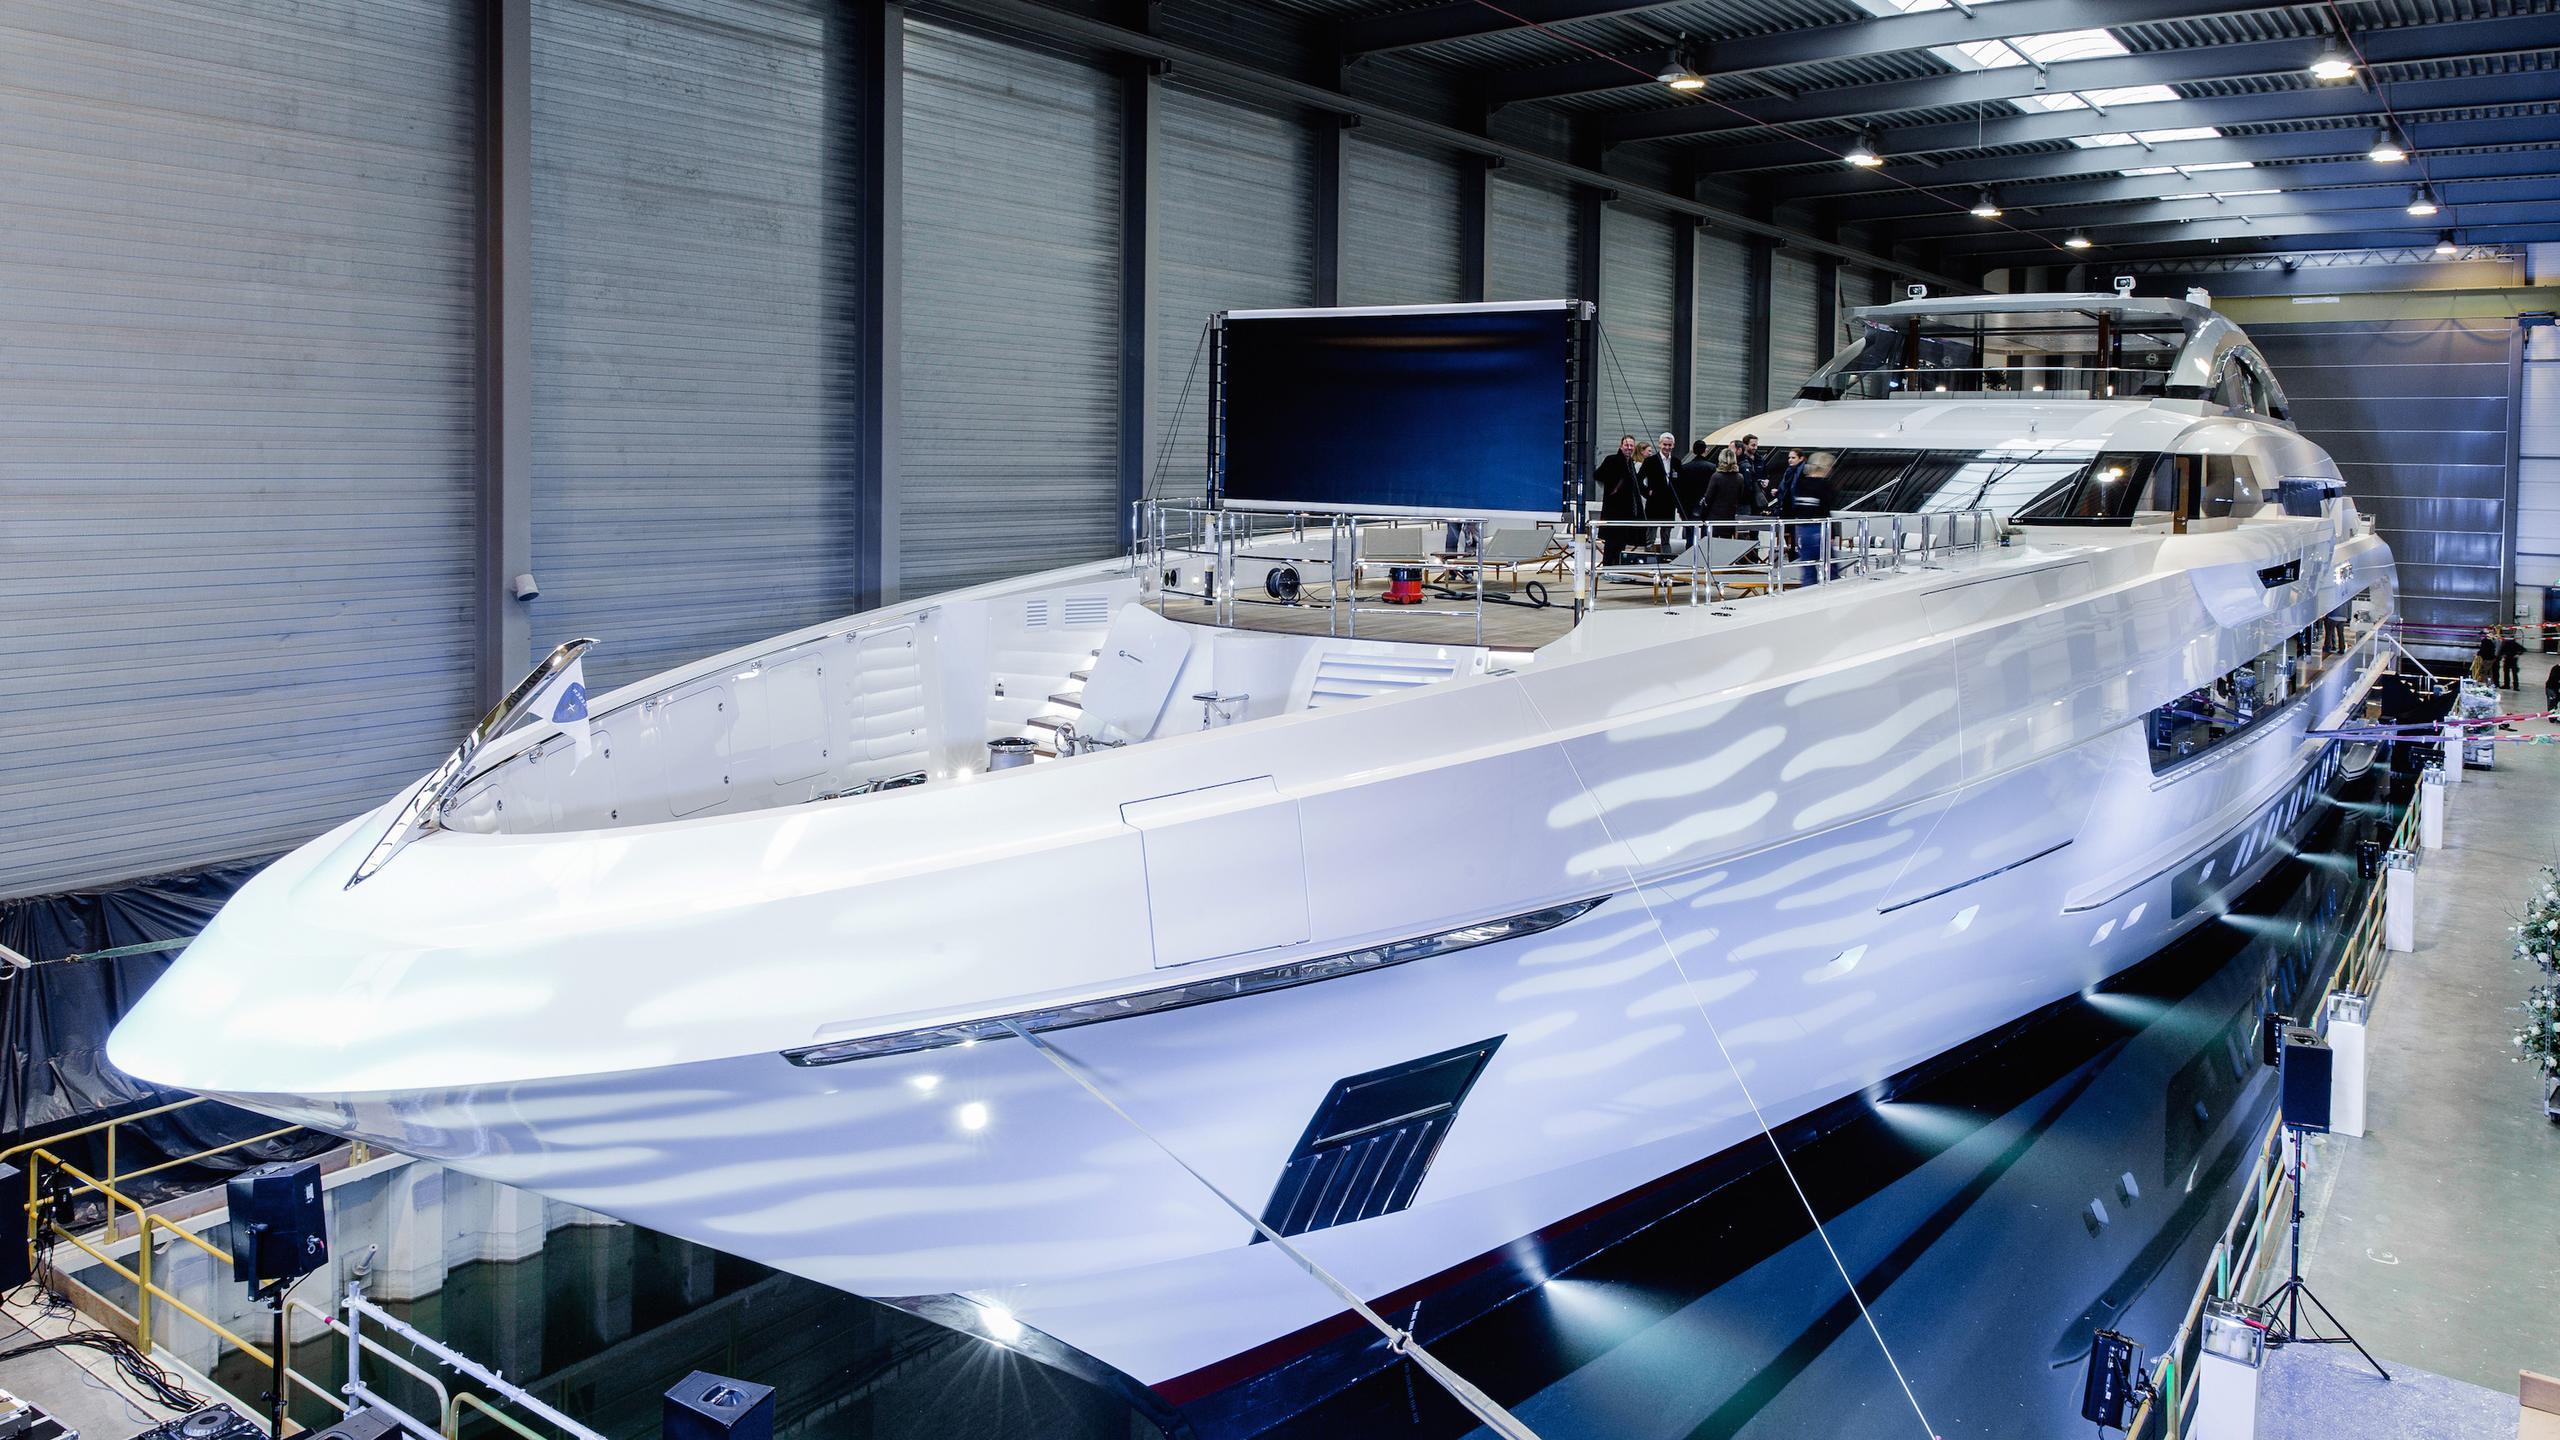 galactica-super-nova-motoryacht-heesen-yachts-2016-70m-launch-party